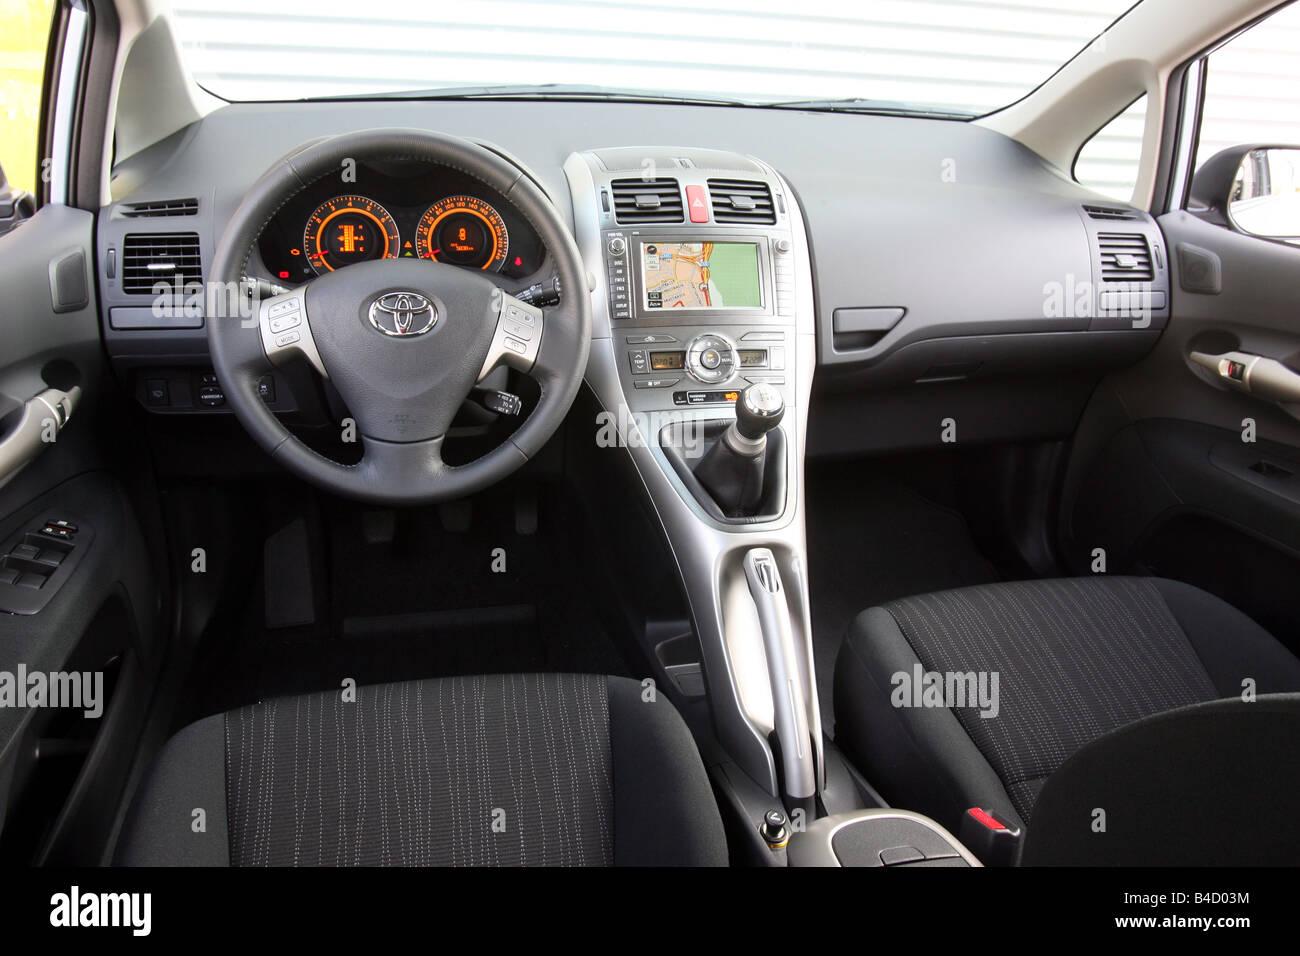 Toyota Auris 1 6 Dual Vvt I Executive Model Year 2007 Silver Stock Photo Royalty Free Image